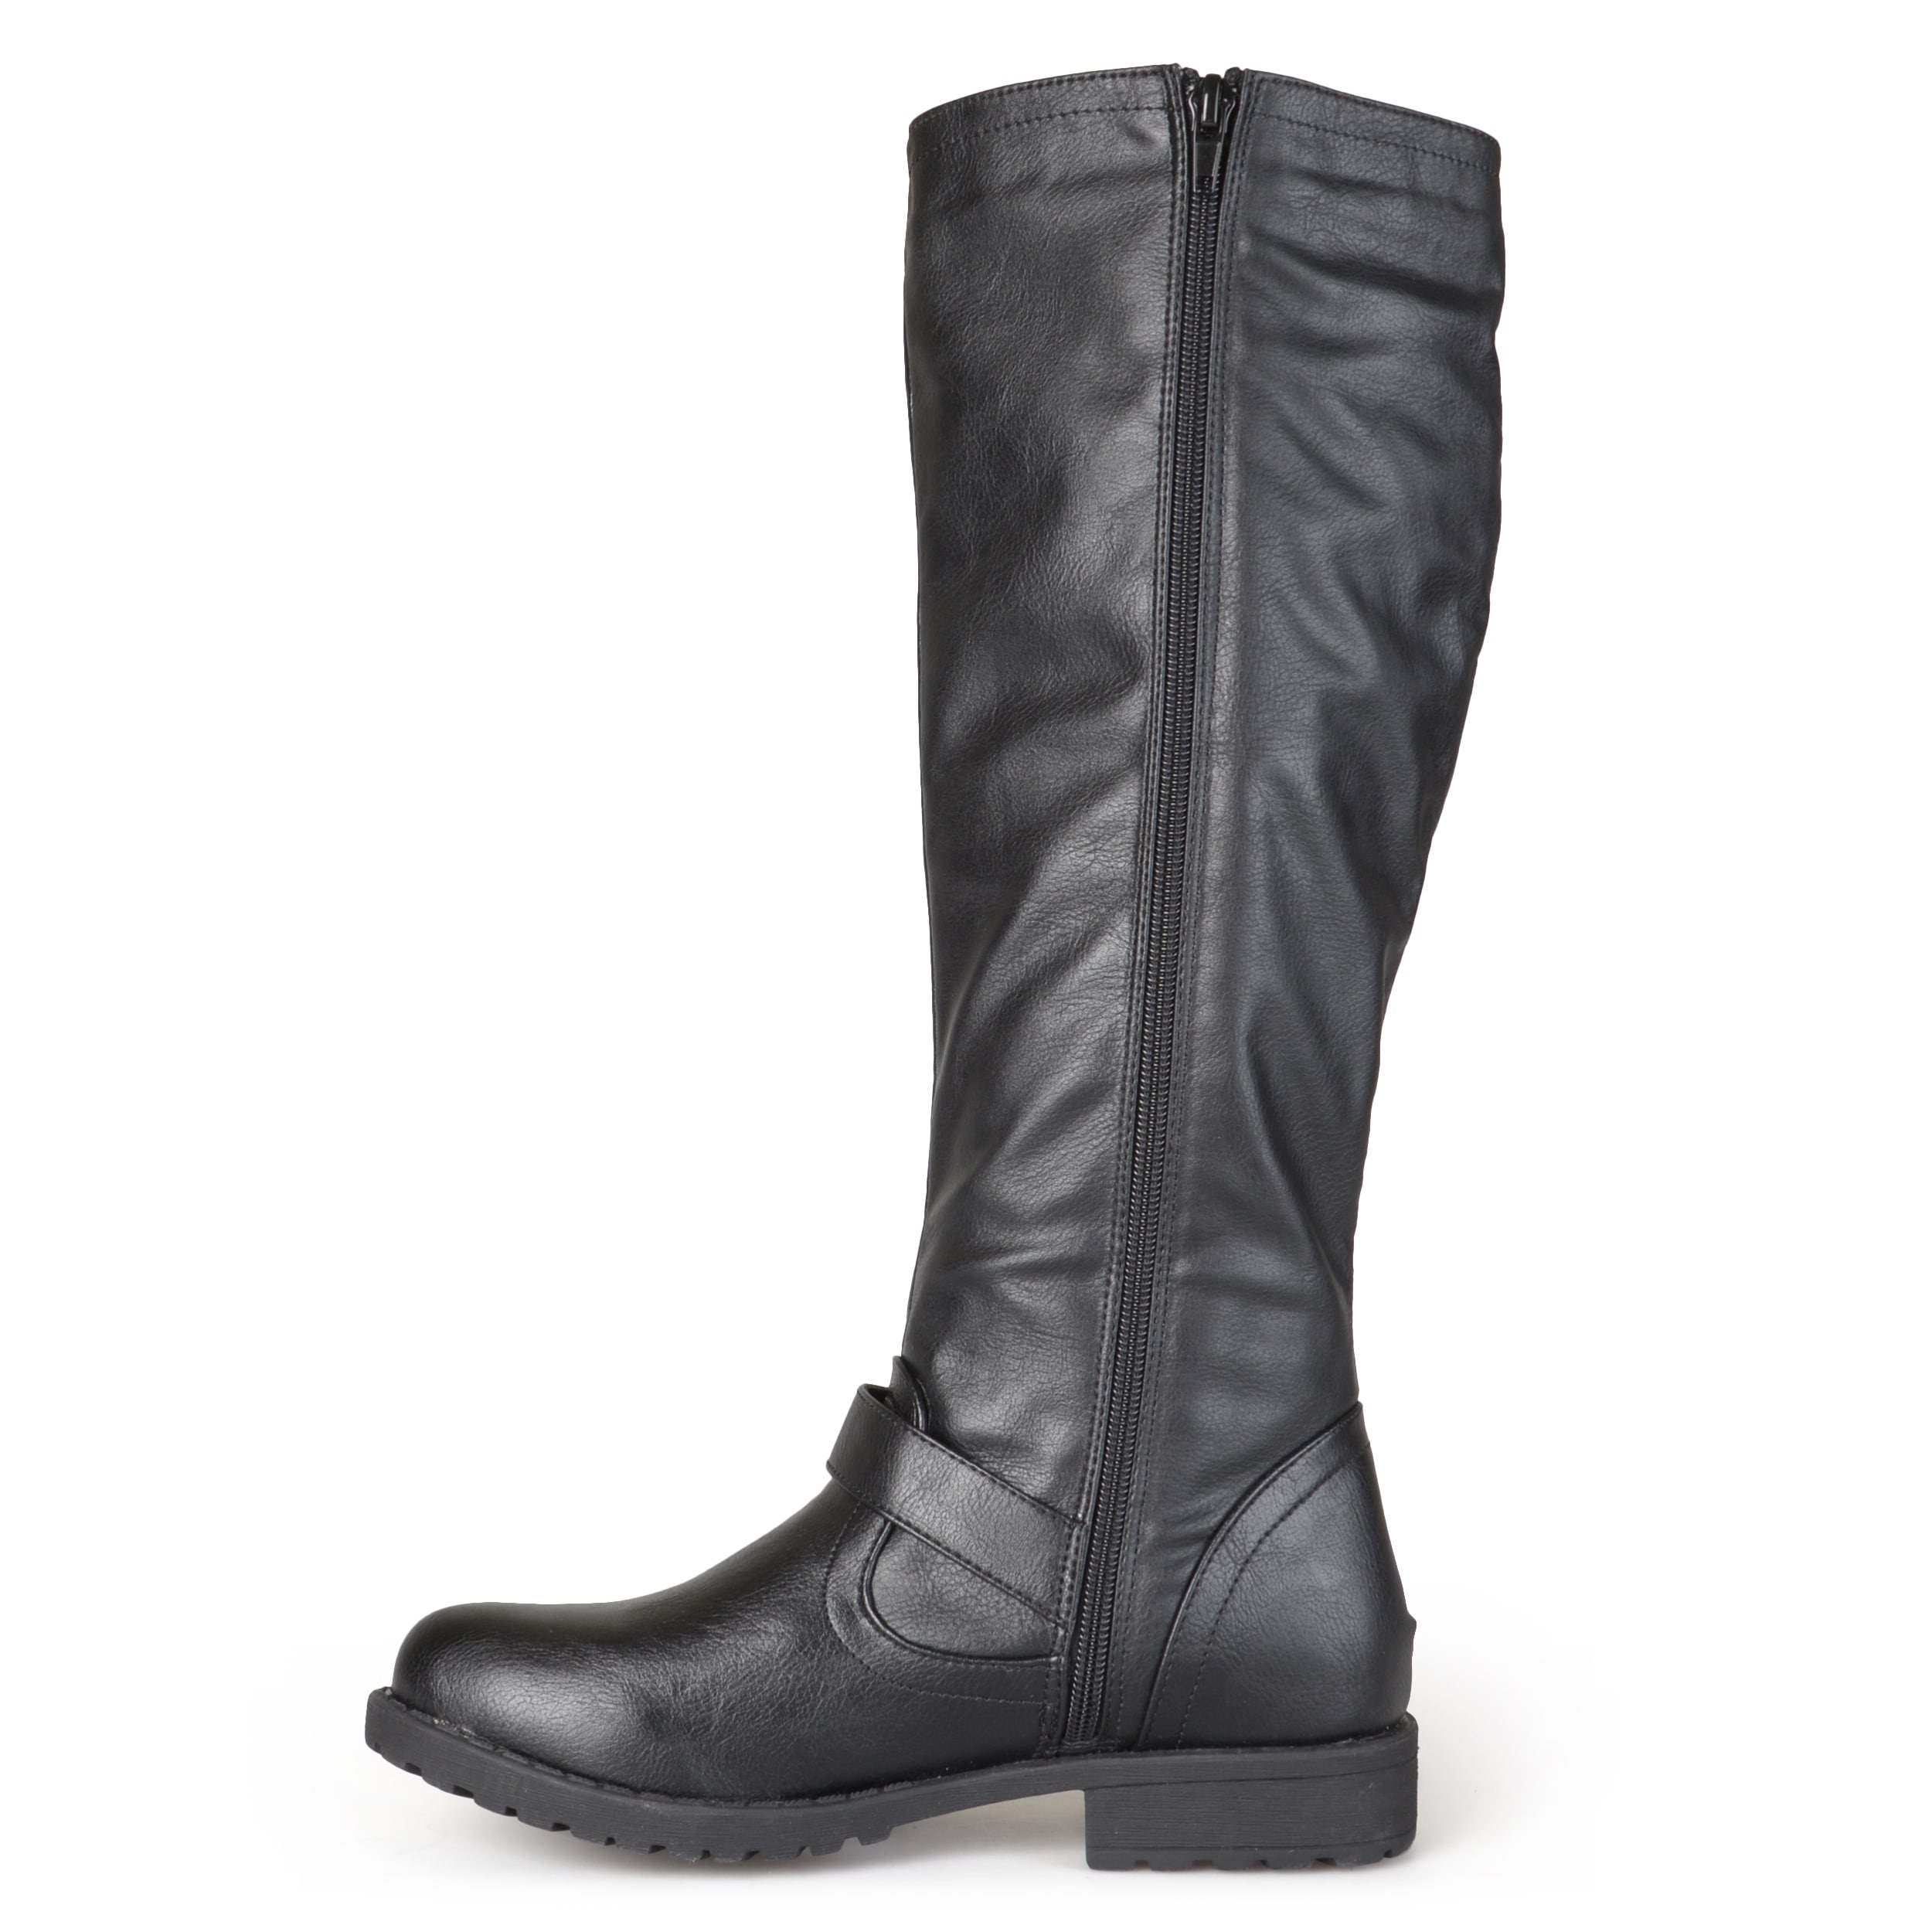 Journee Collection Women's 'Tilt' Regular and Wide Calf Studded Zipper Riding  Boots - Free Shipping Today - Overstock.com - 17585155